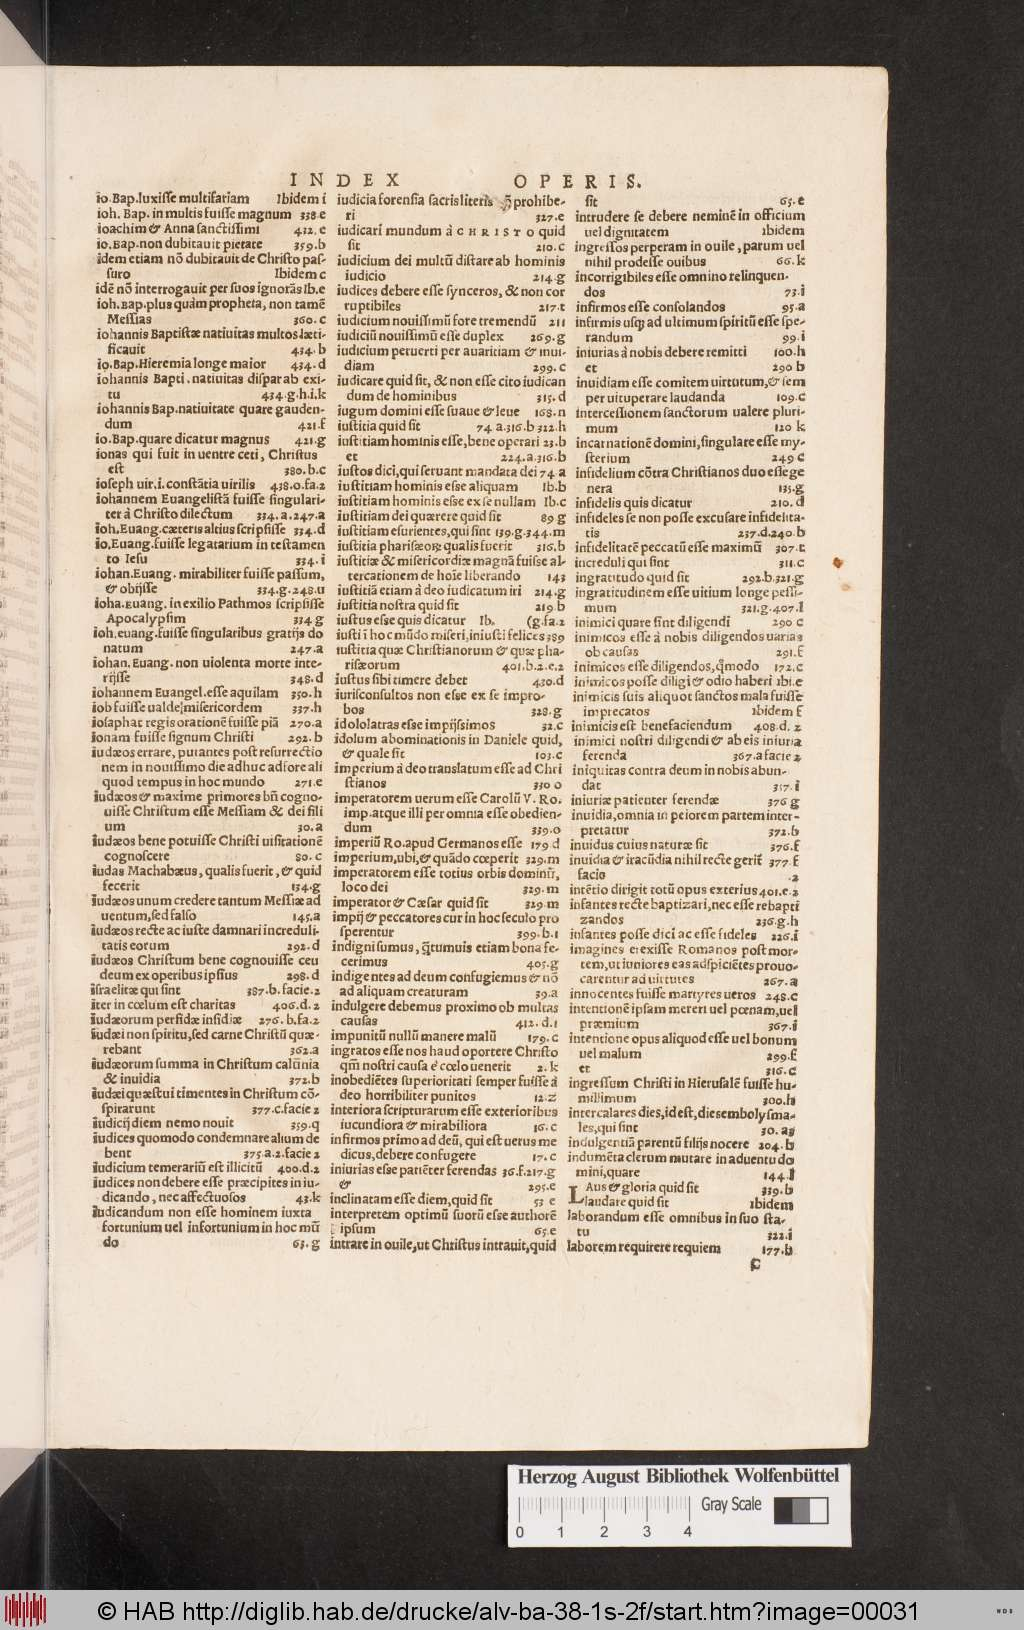 http://diglib.hab.de/drucke/alv-ba-38-1s-2f/00031.jpg